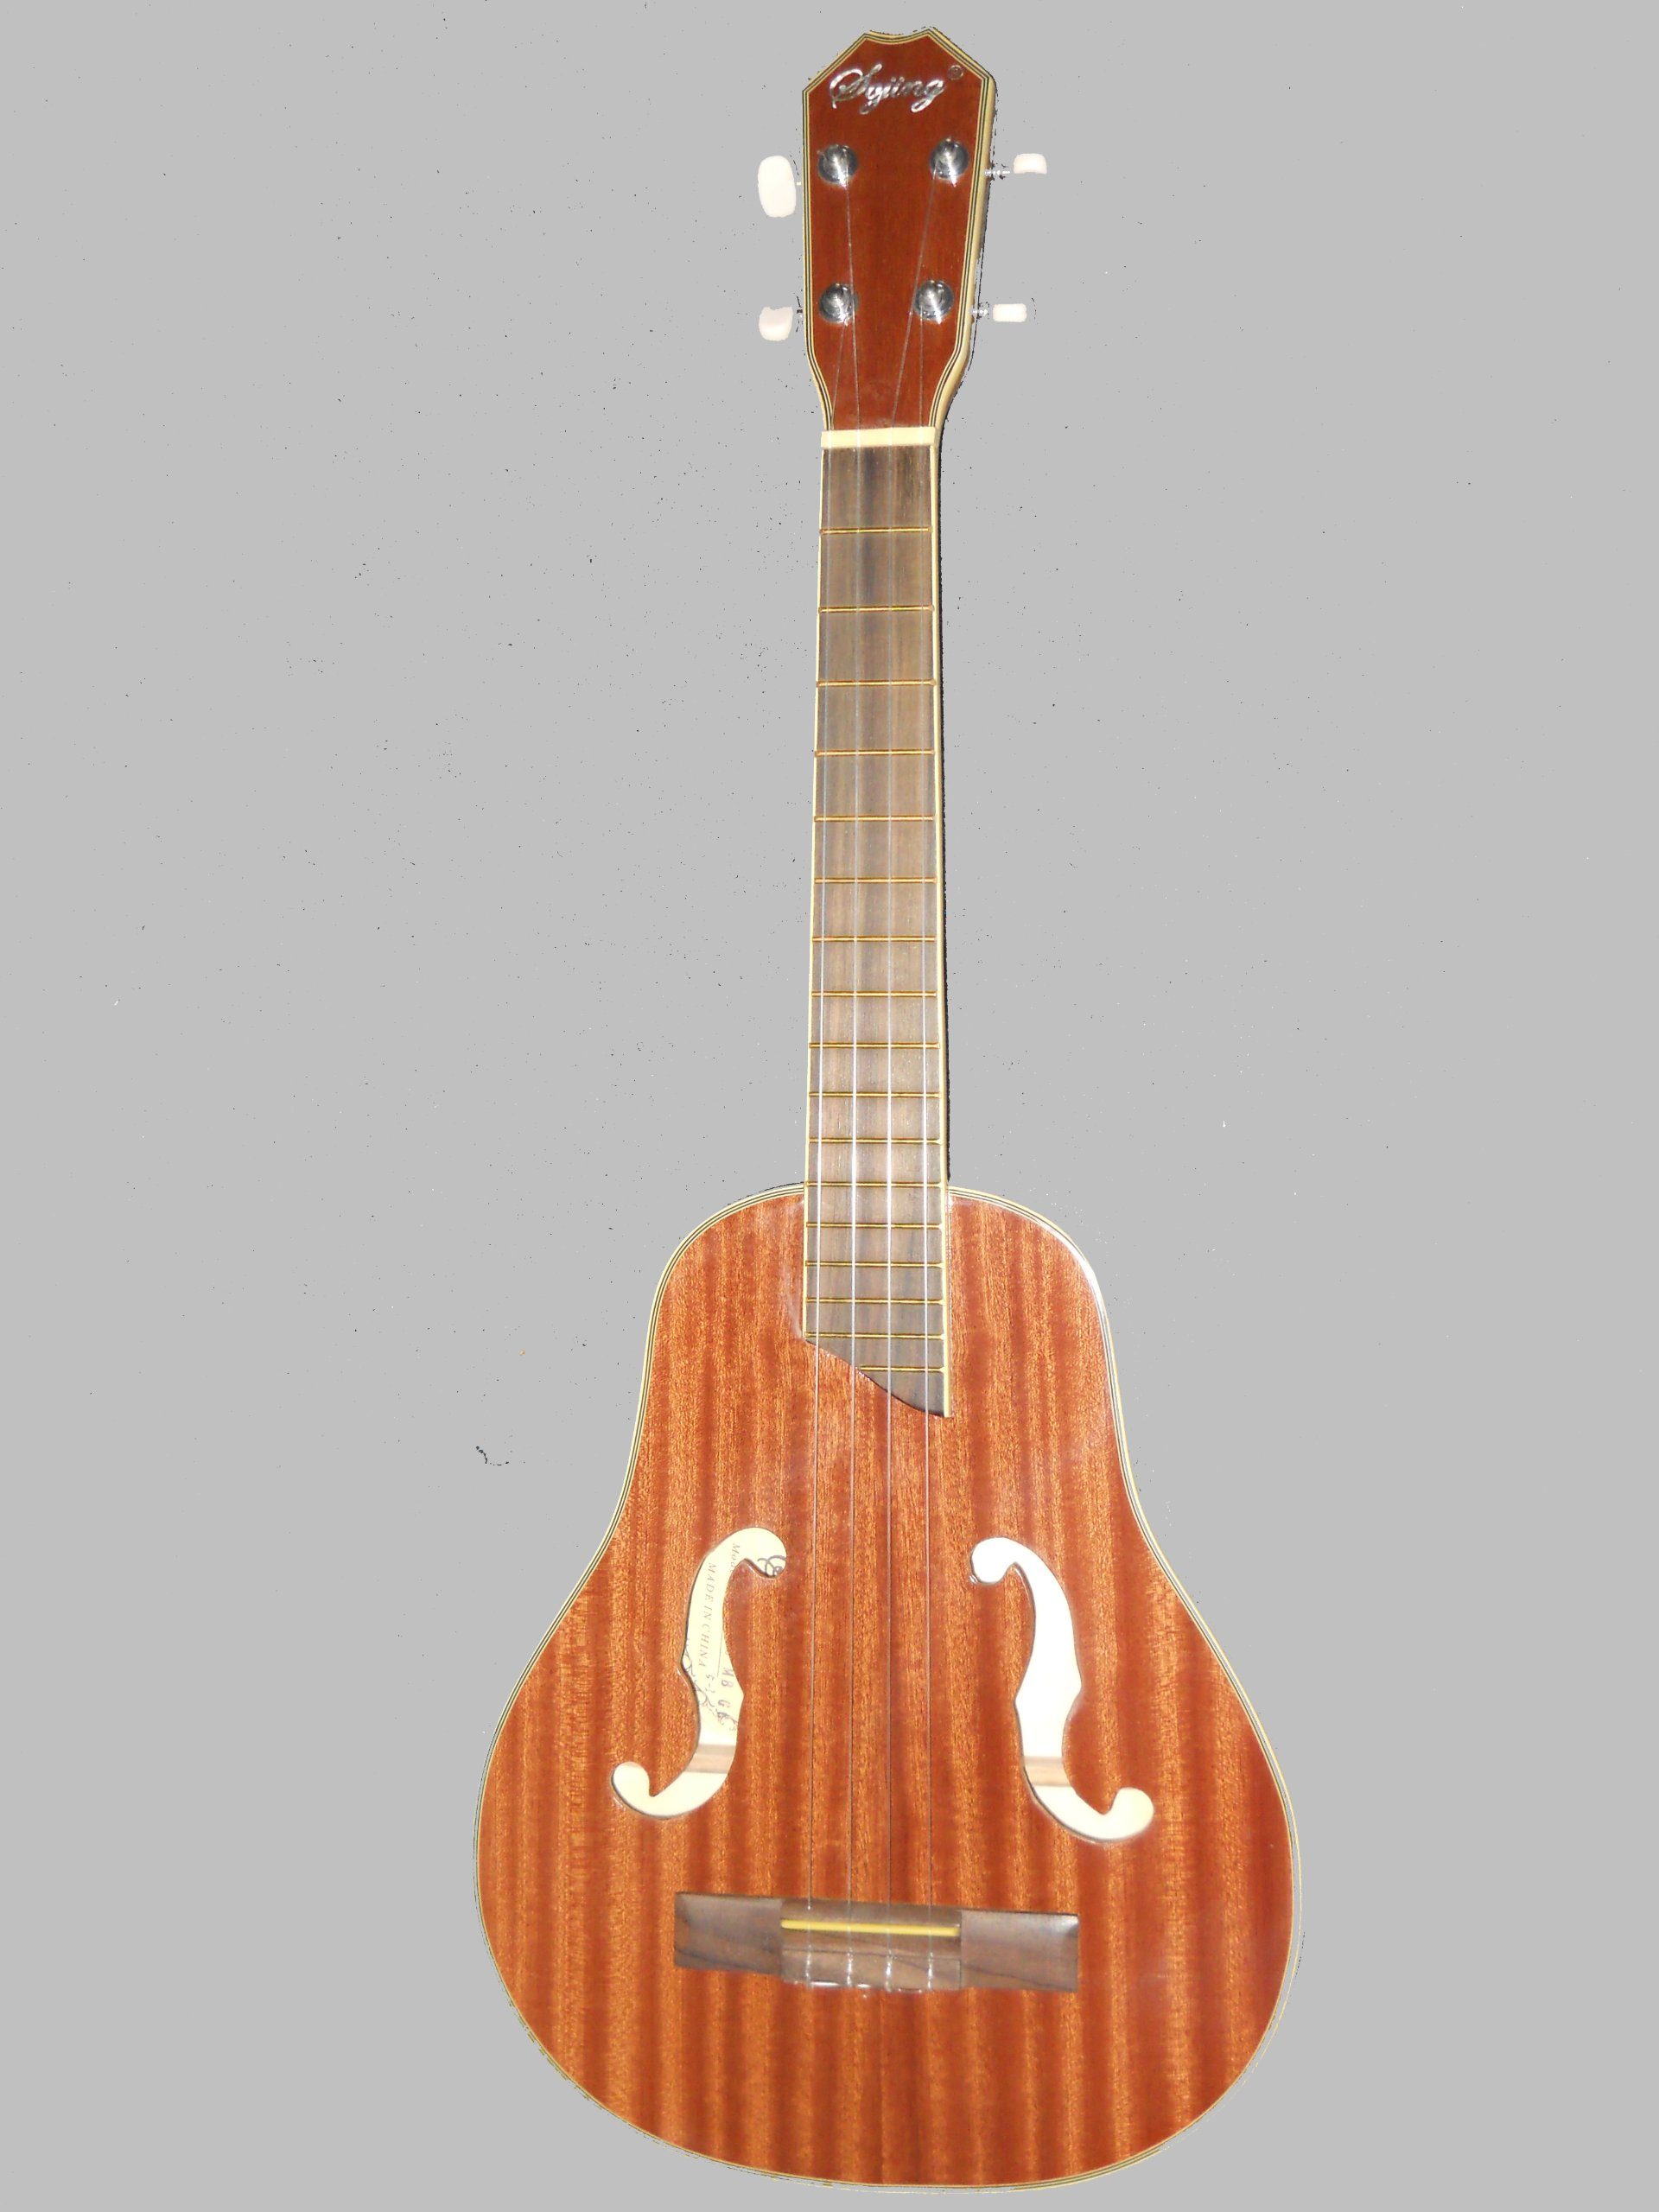 F Sound Hole 28'' Baritone Ukulele(convertible to a Tenor Guitar)